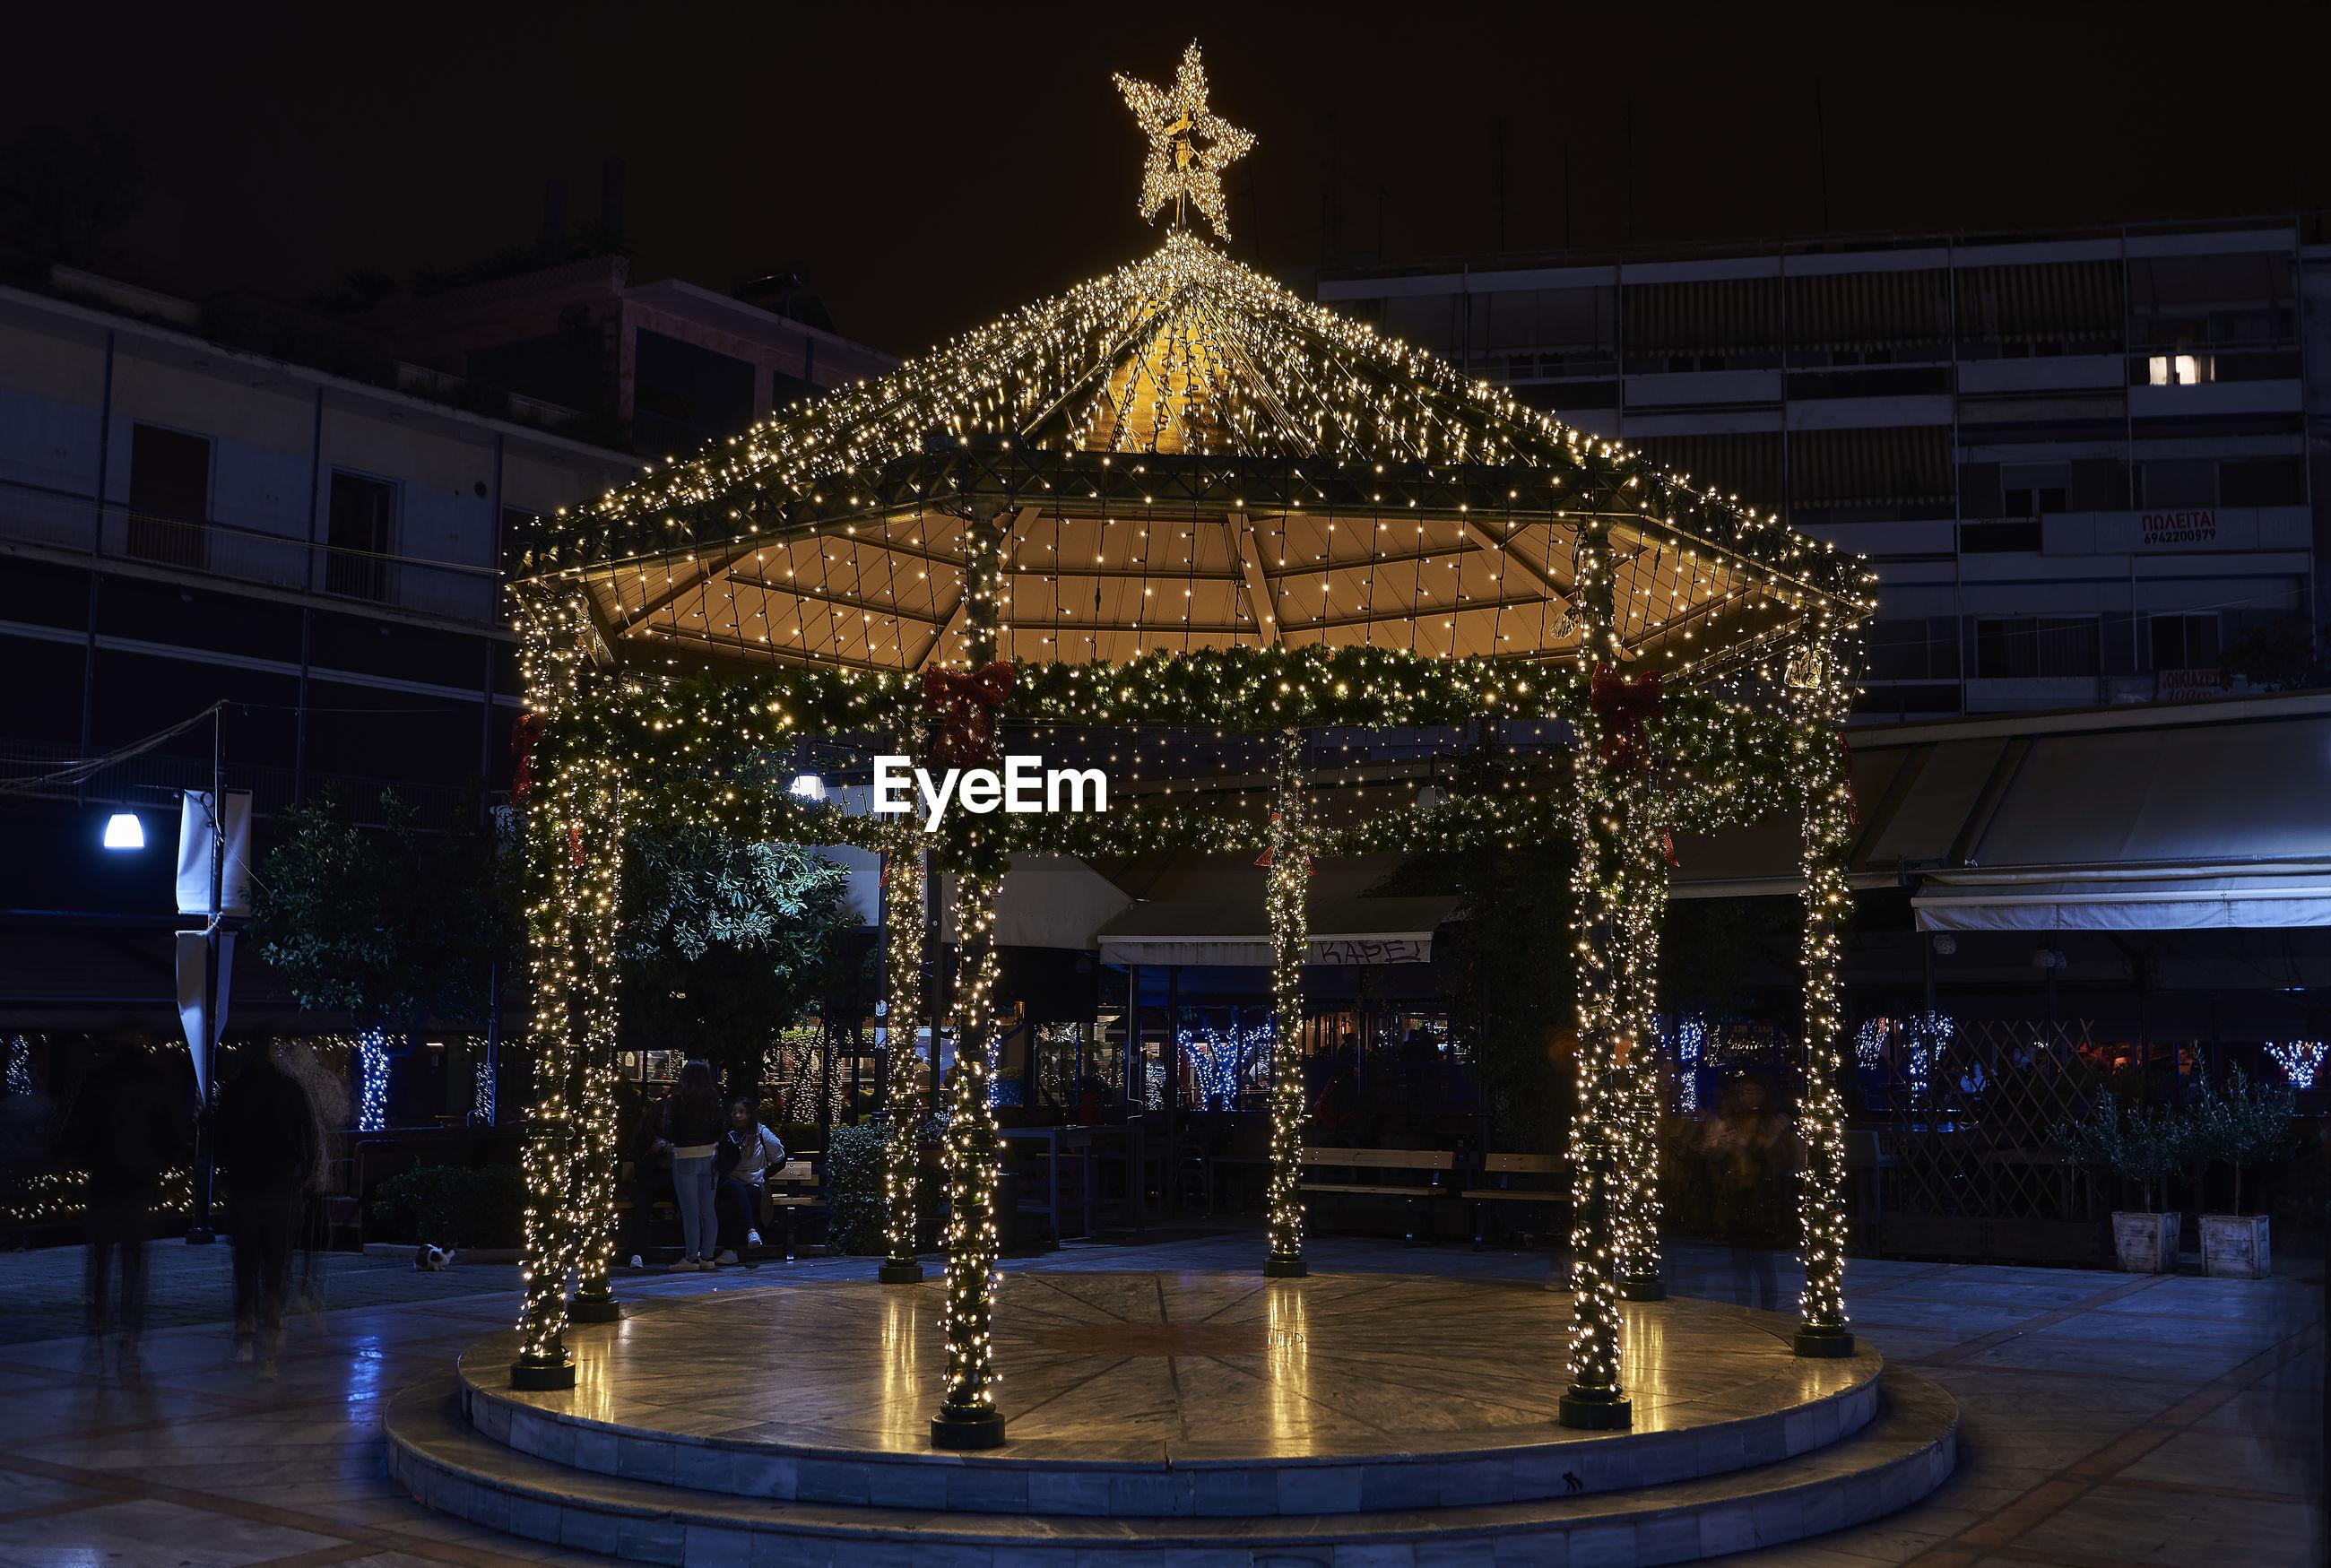 ILLUMINATED CHRISTMAS LIGHTS ON BUILDING